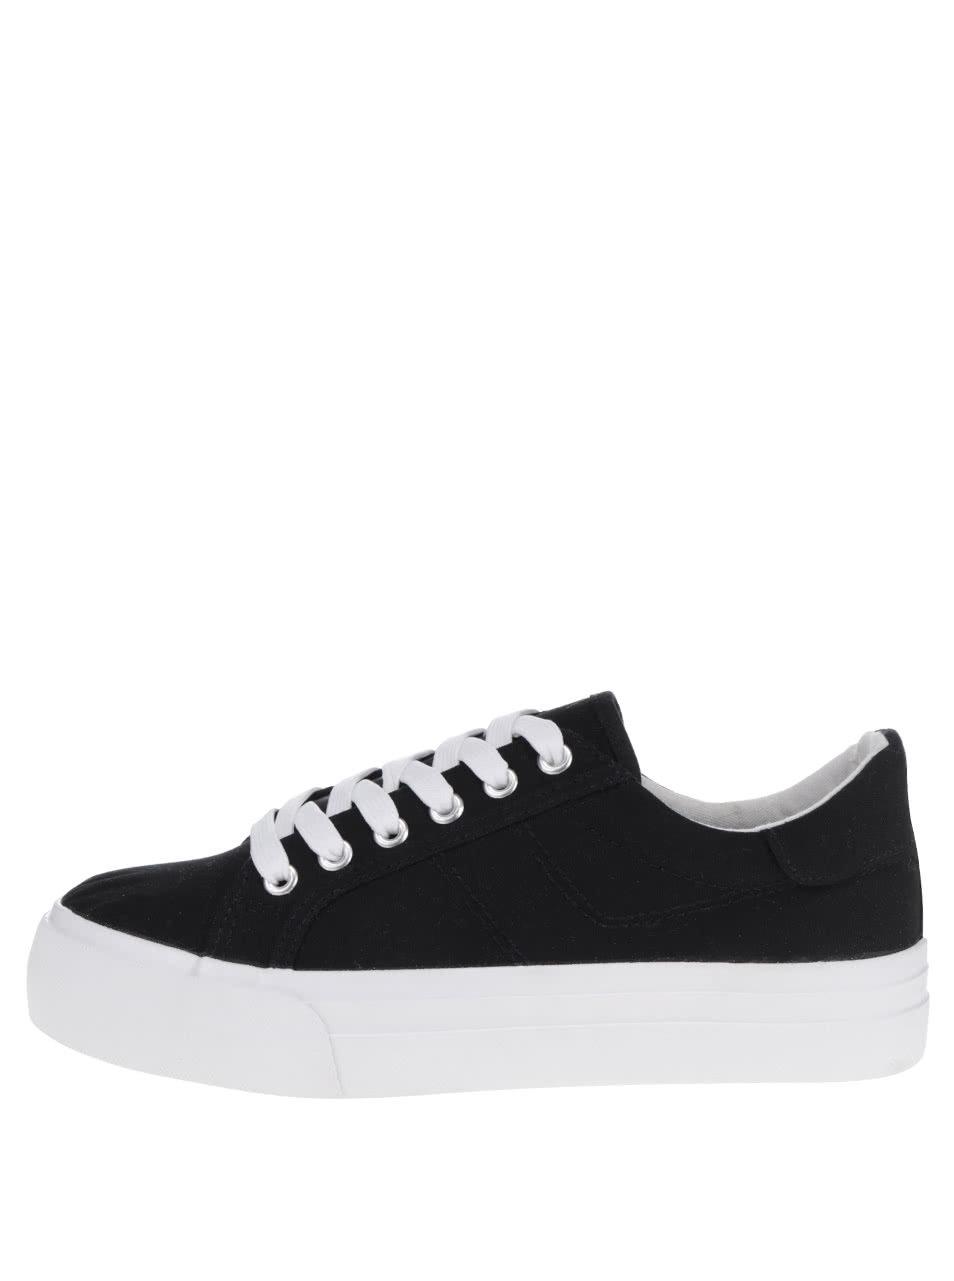 Čierno-biele tenisky Tamaris ... db408f28ae2